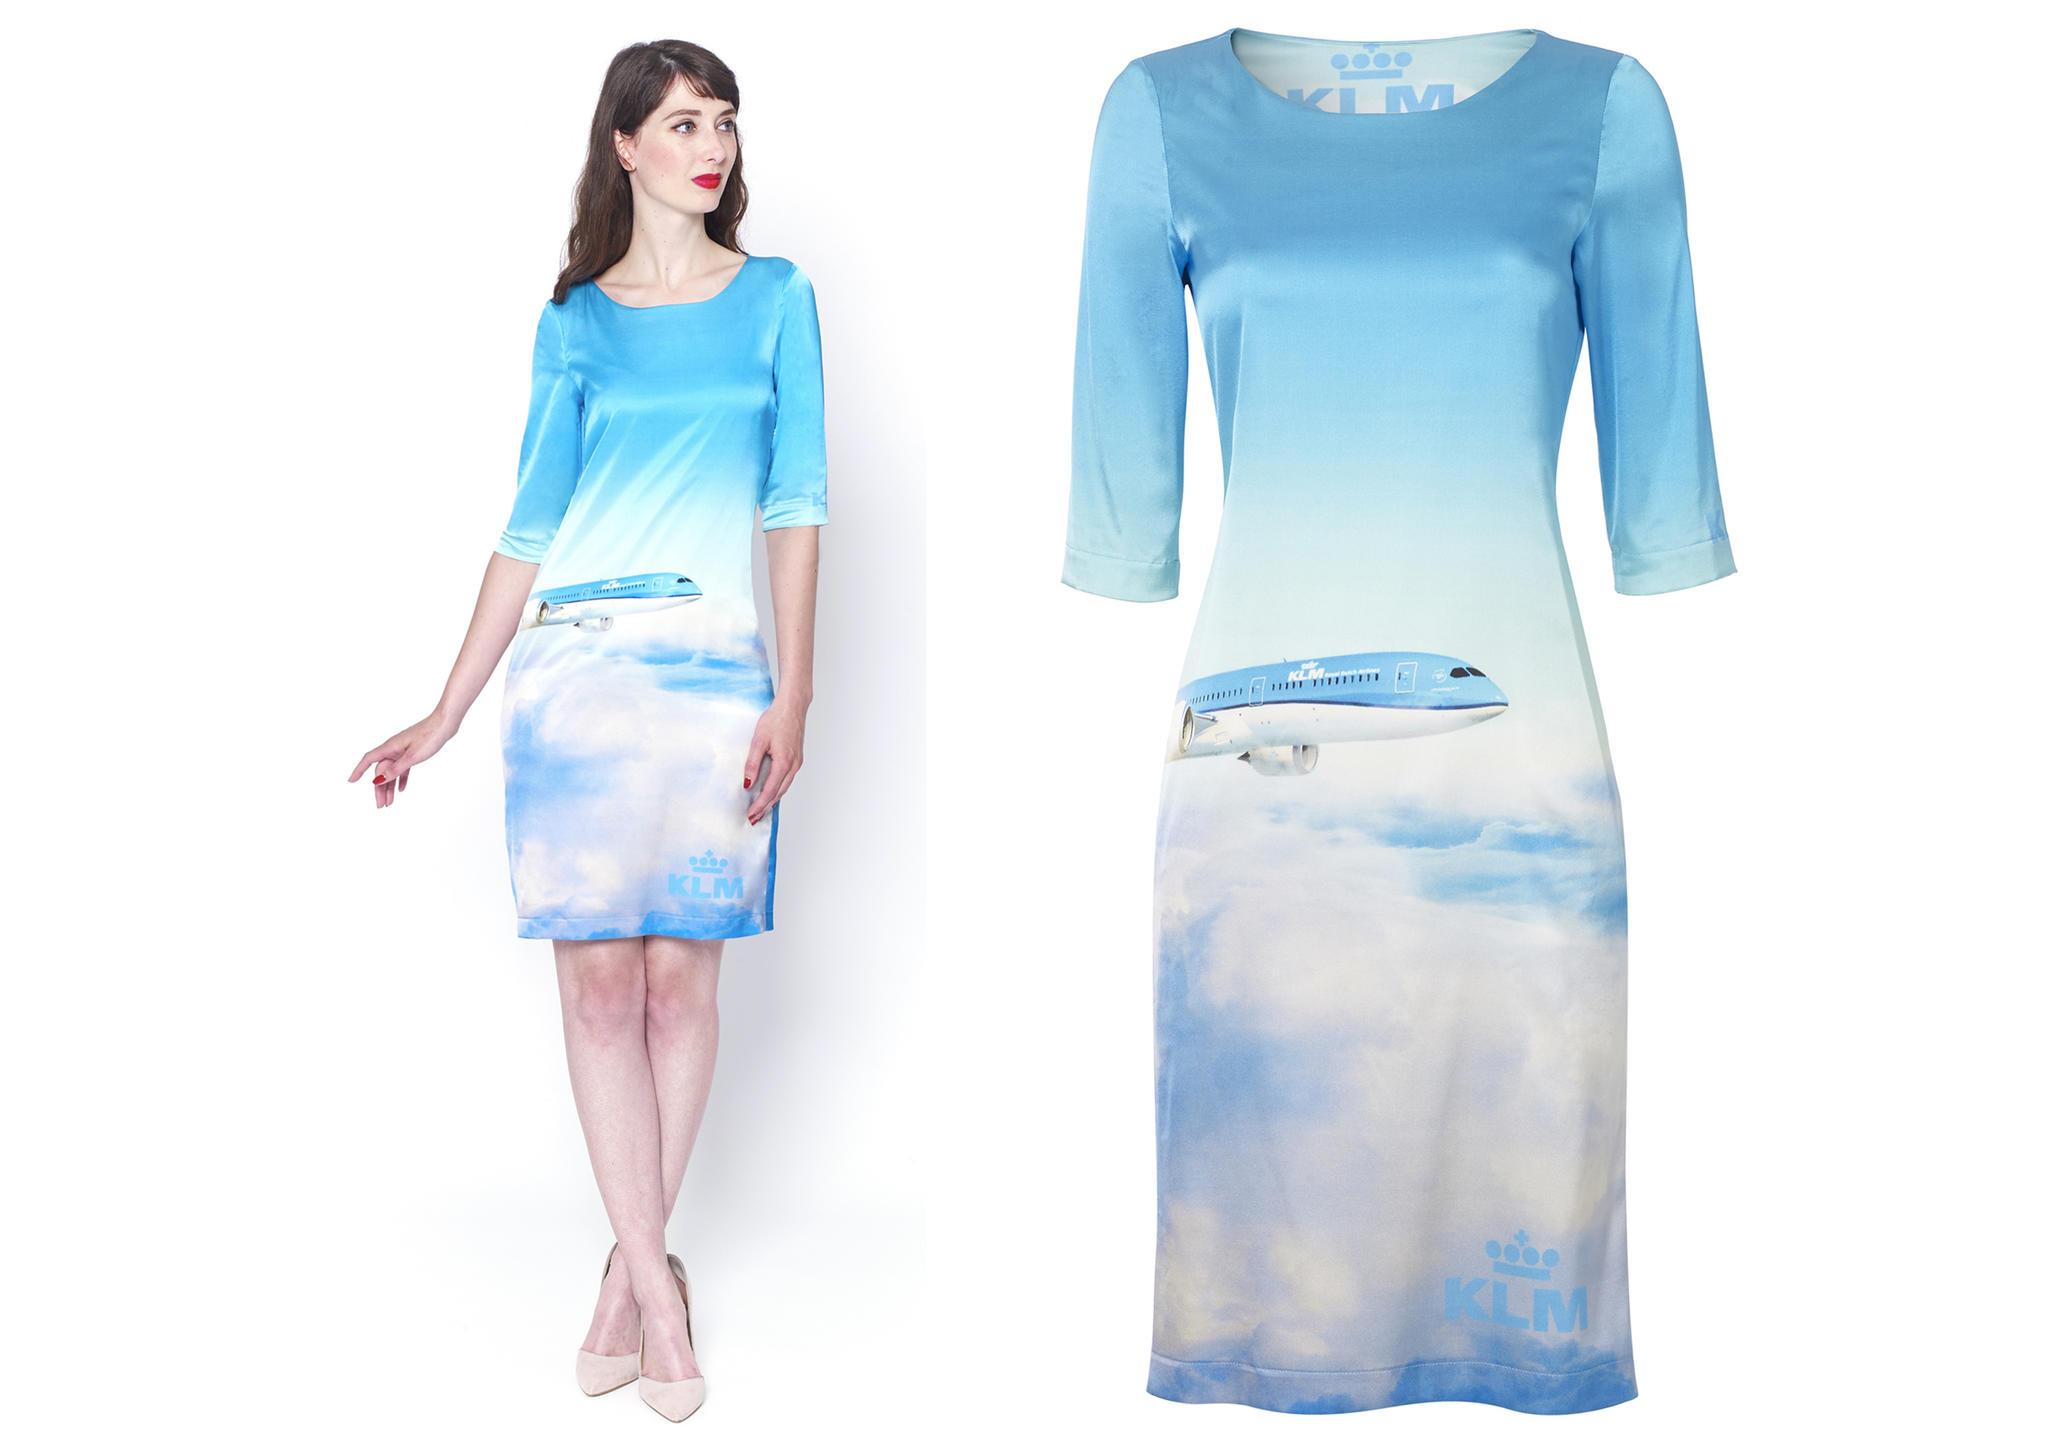 StoryDress Klm dress